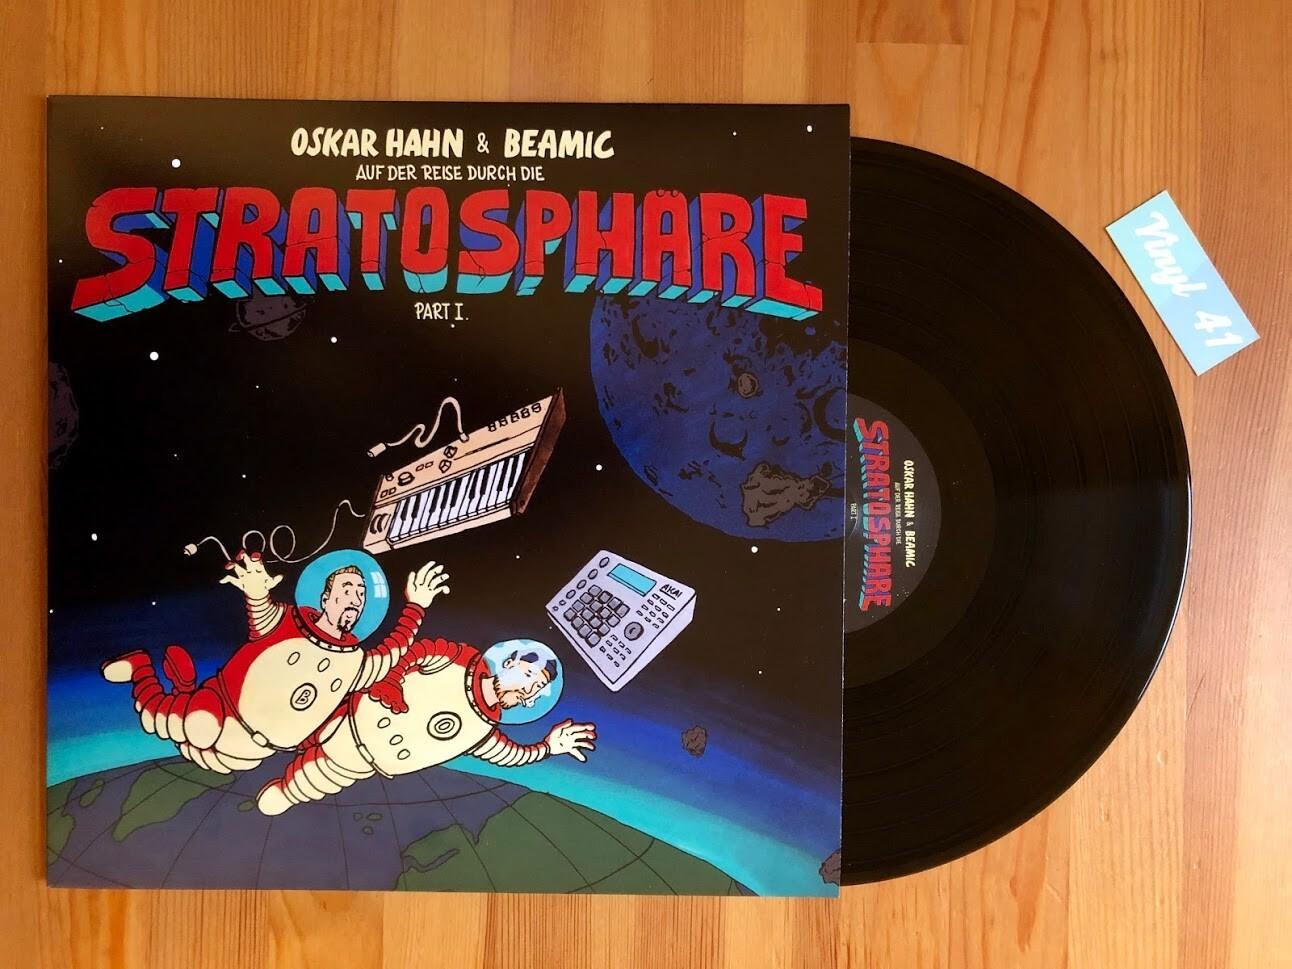 Oskar Hahn x Beamic - Stratosphäre I